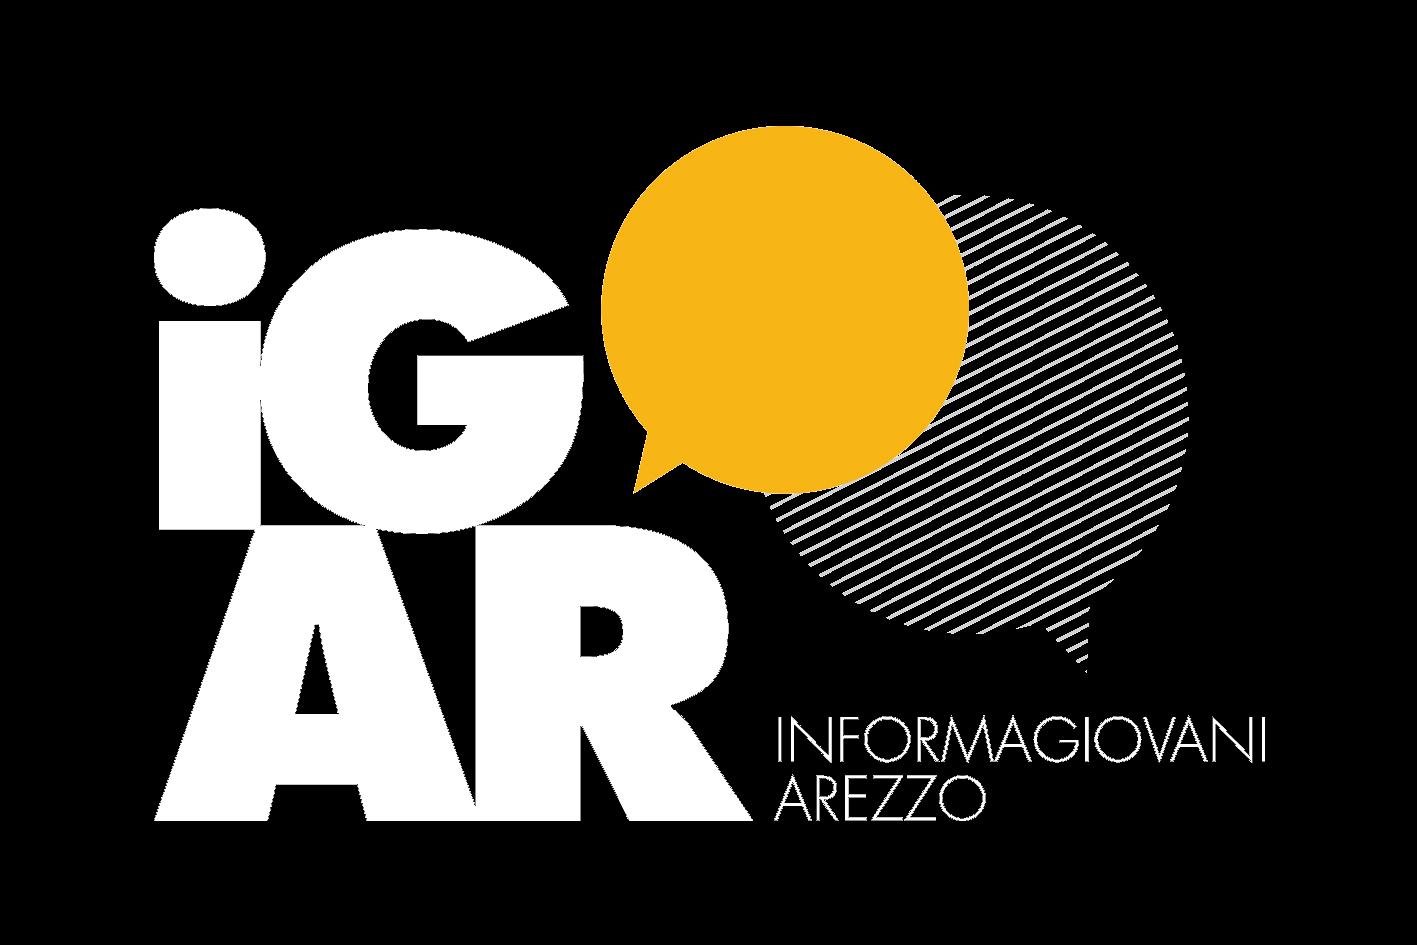 InformaGiovani Arezzo